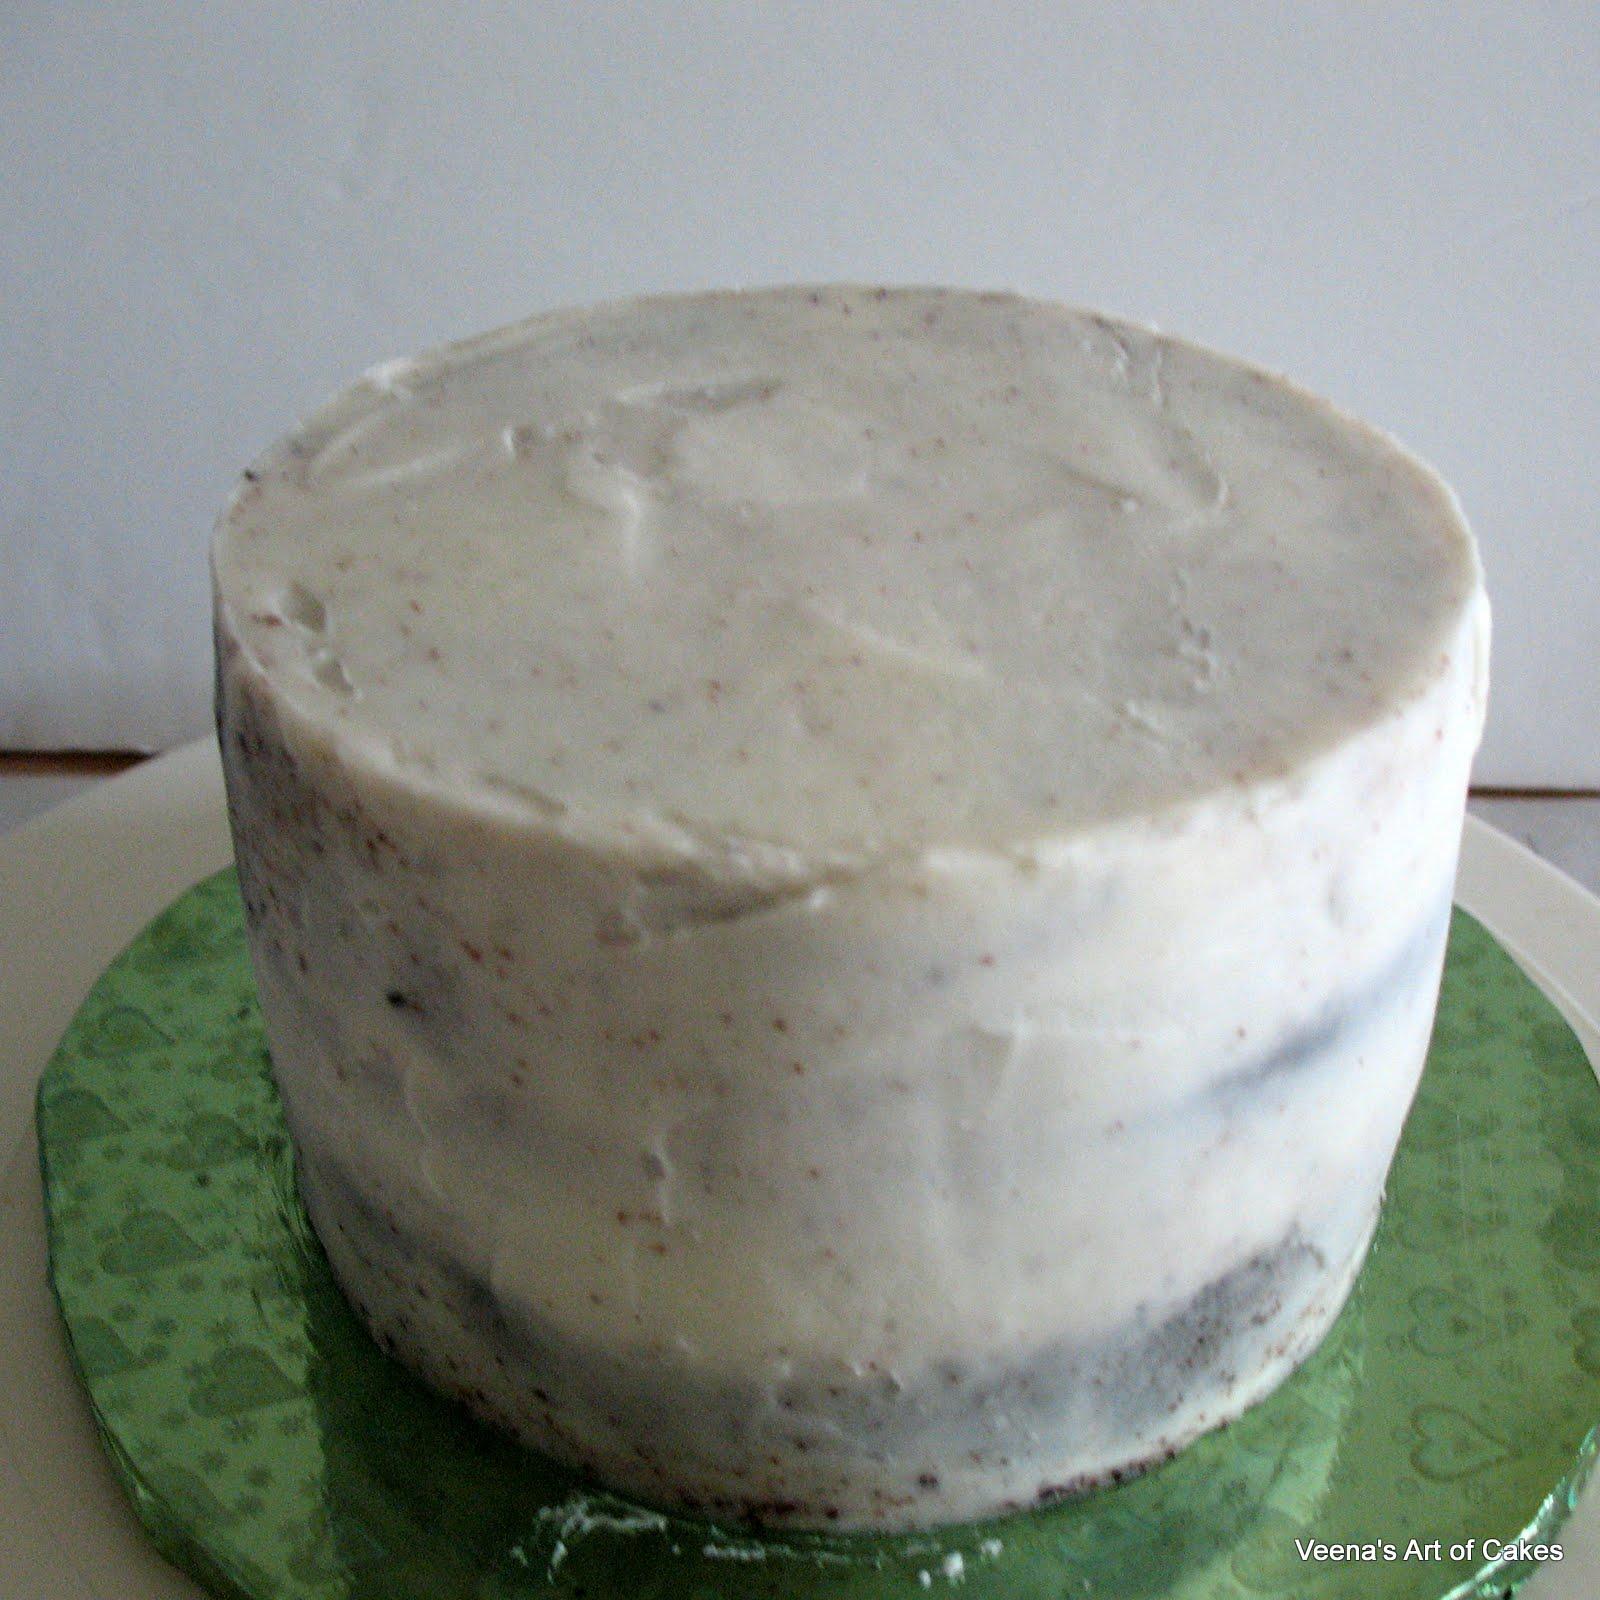 Veena Art Of Cake Fondant Recipe : Veena s Art of Cakes: How to make a fondant Gift Box Cake - I